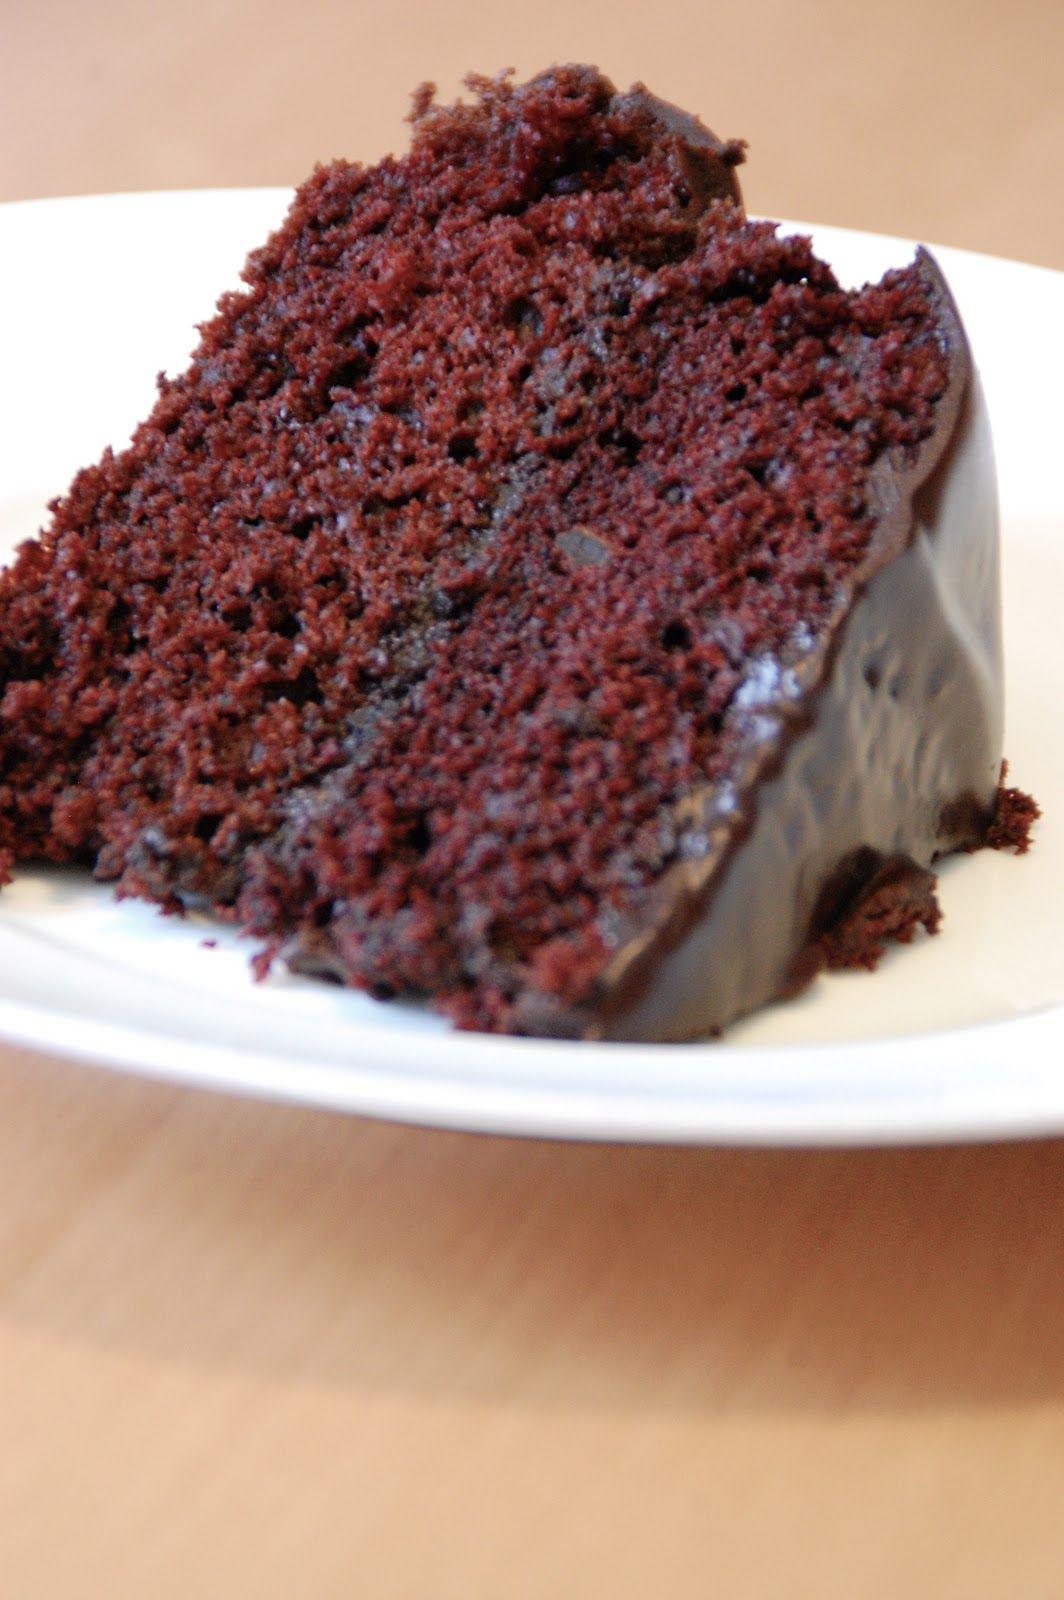 Vegan super moist chocolate cake recipe